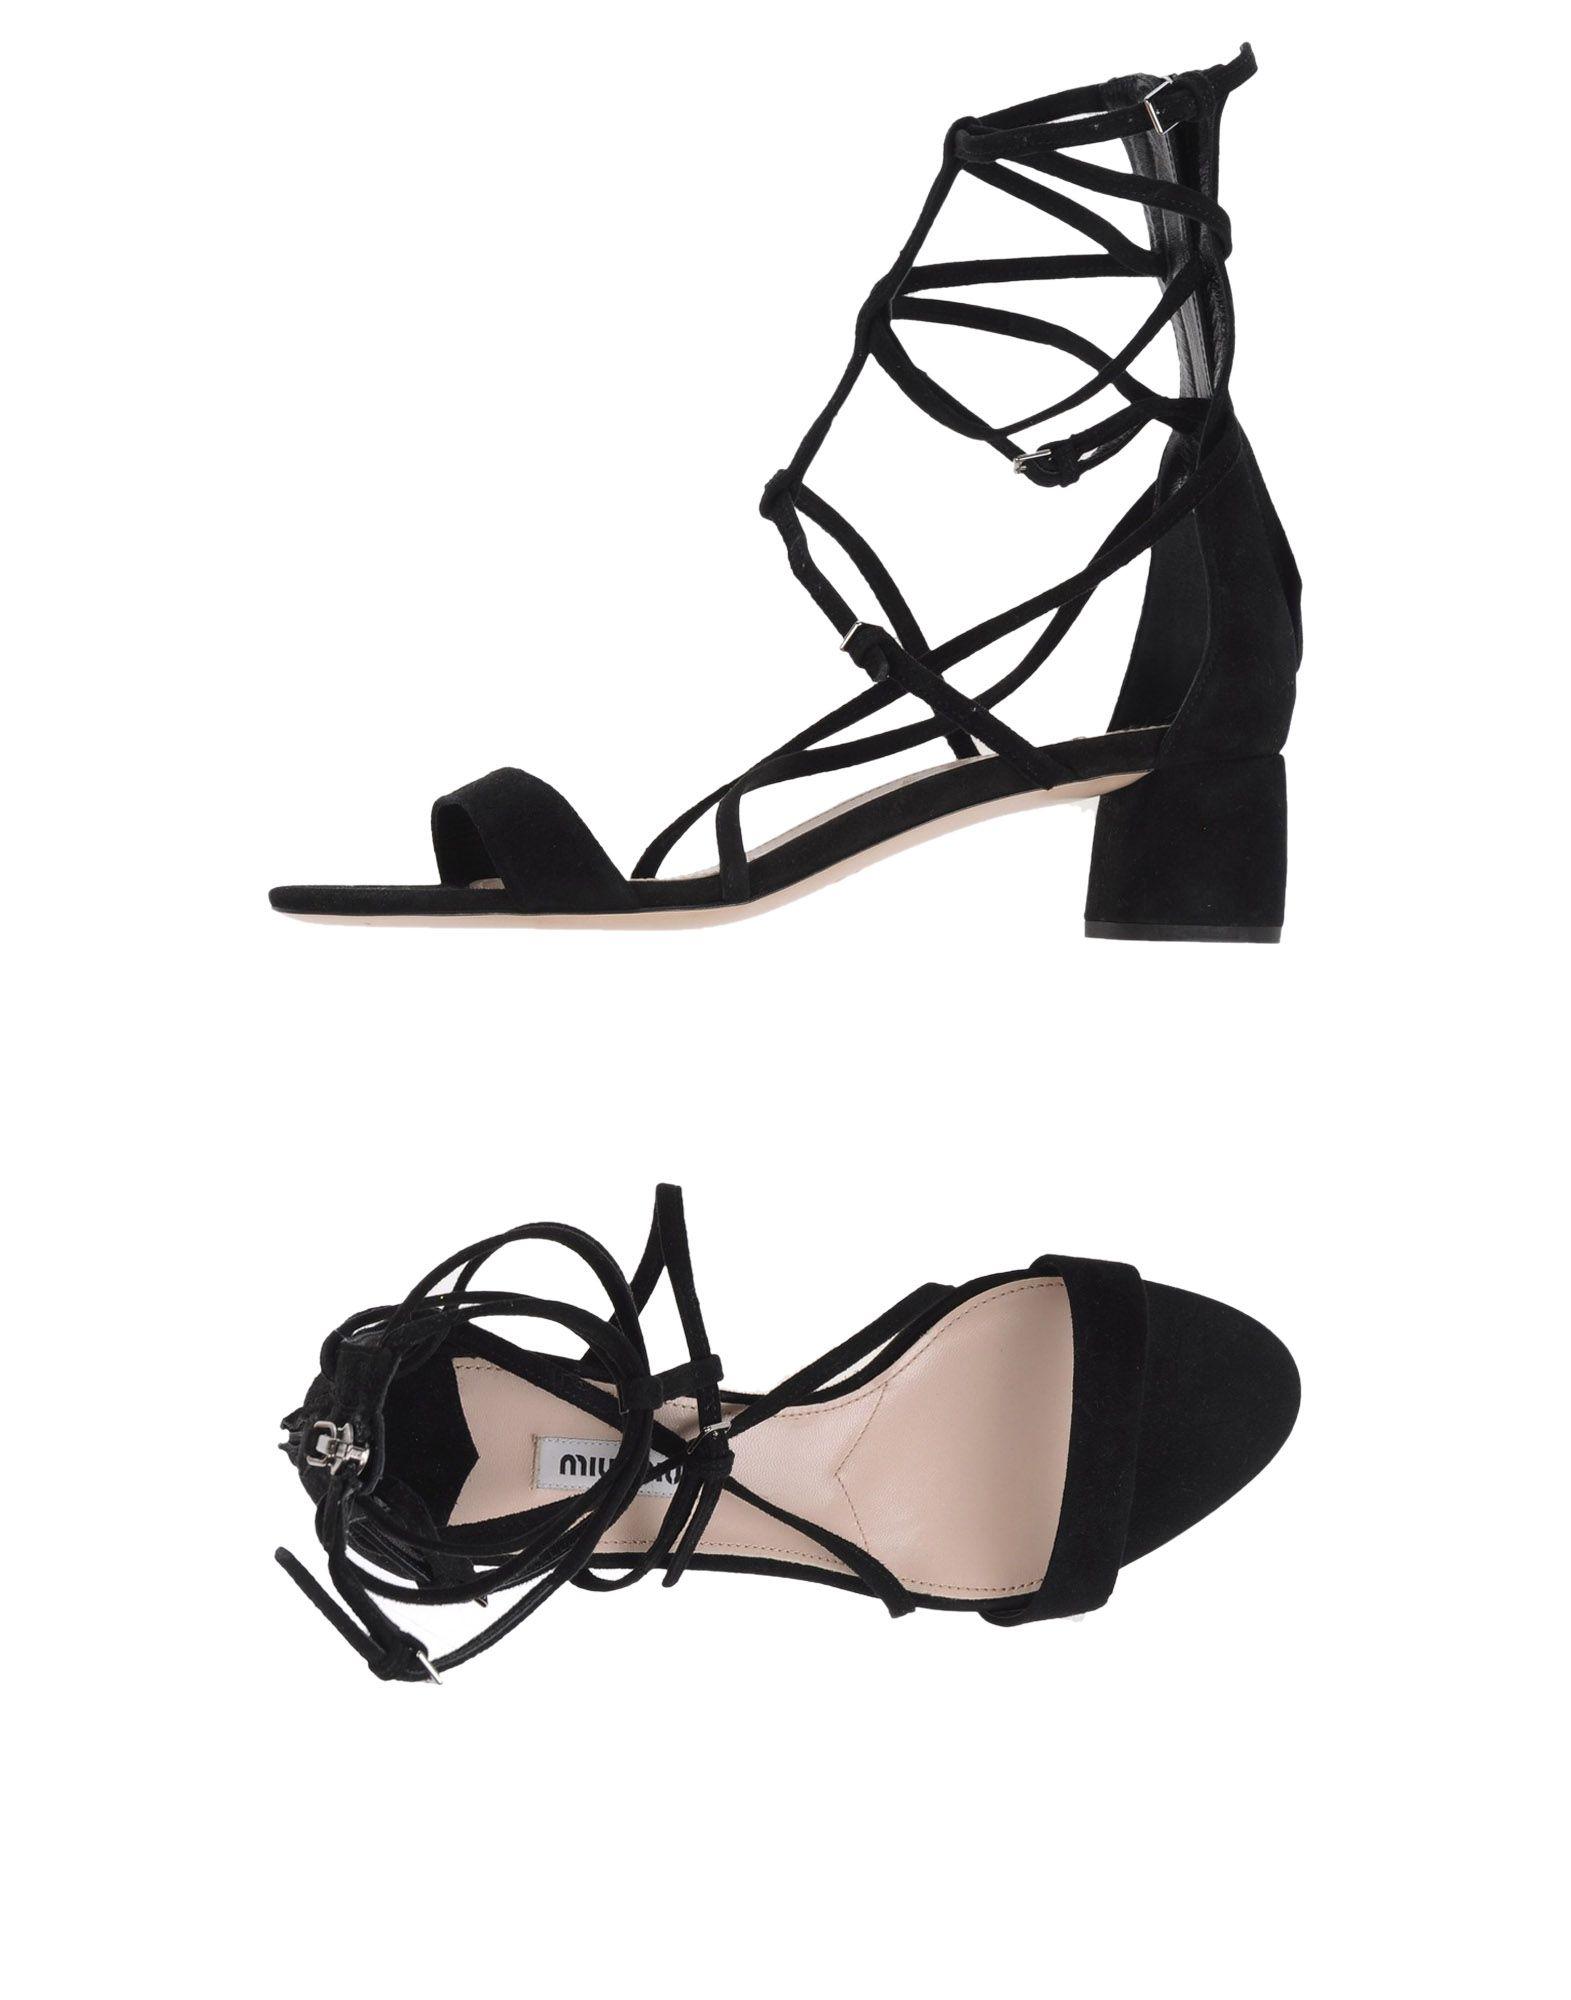 909e87015afa0 Miu Miu Sandals - Women Miu Miu Sandals online on YOOX Lithuania ...